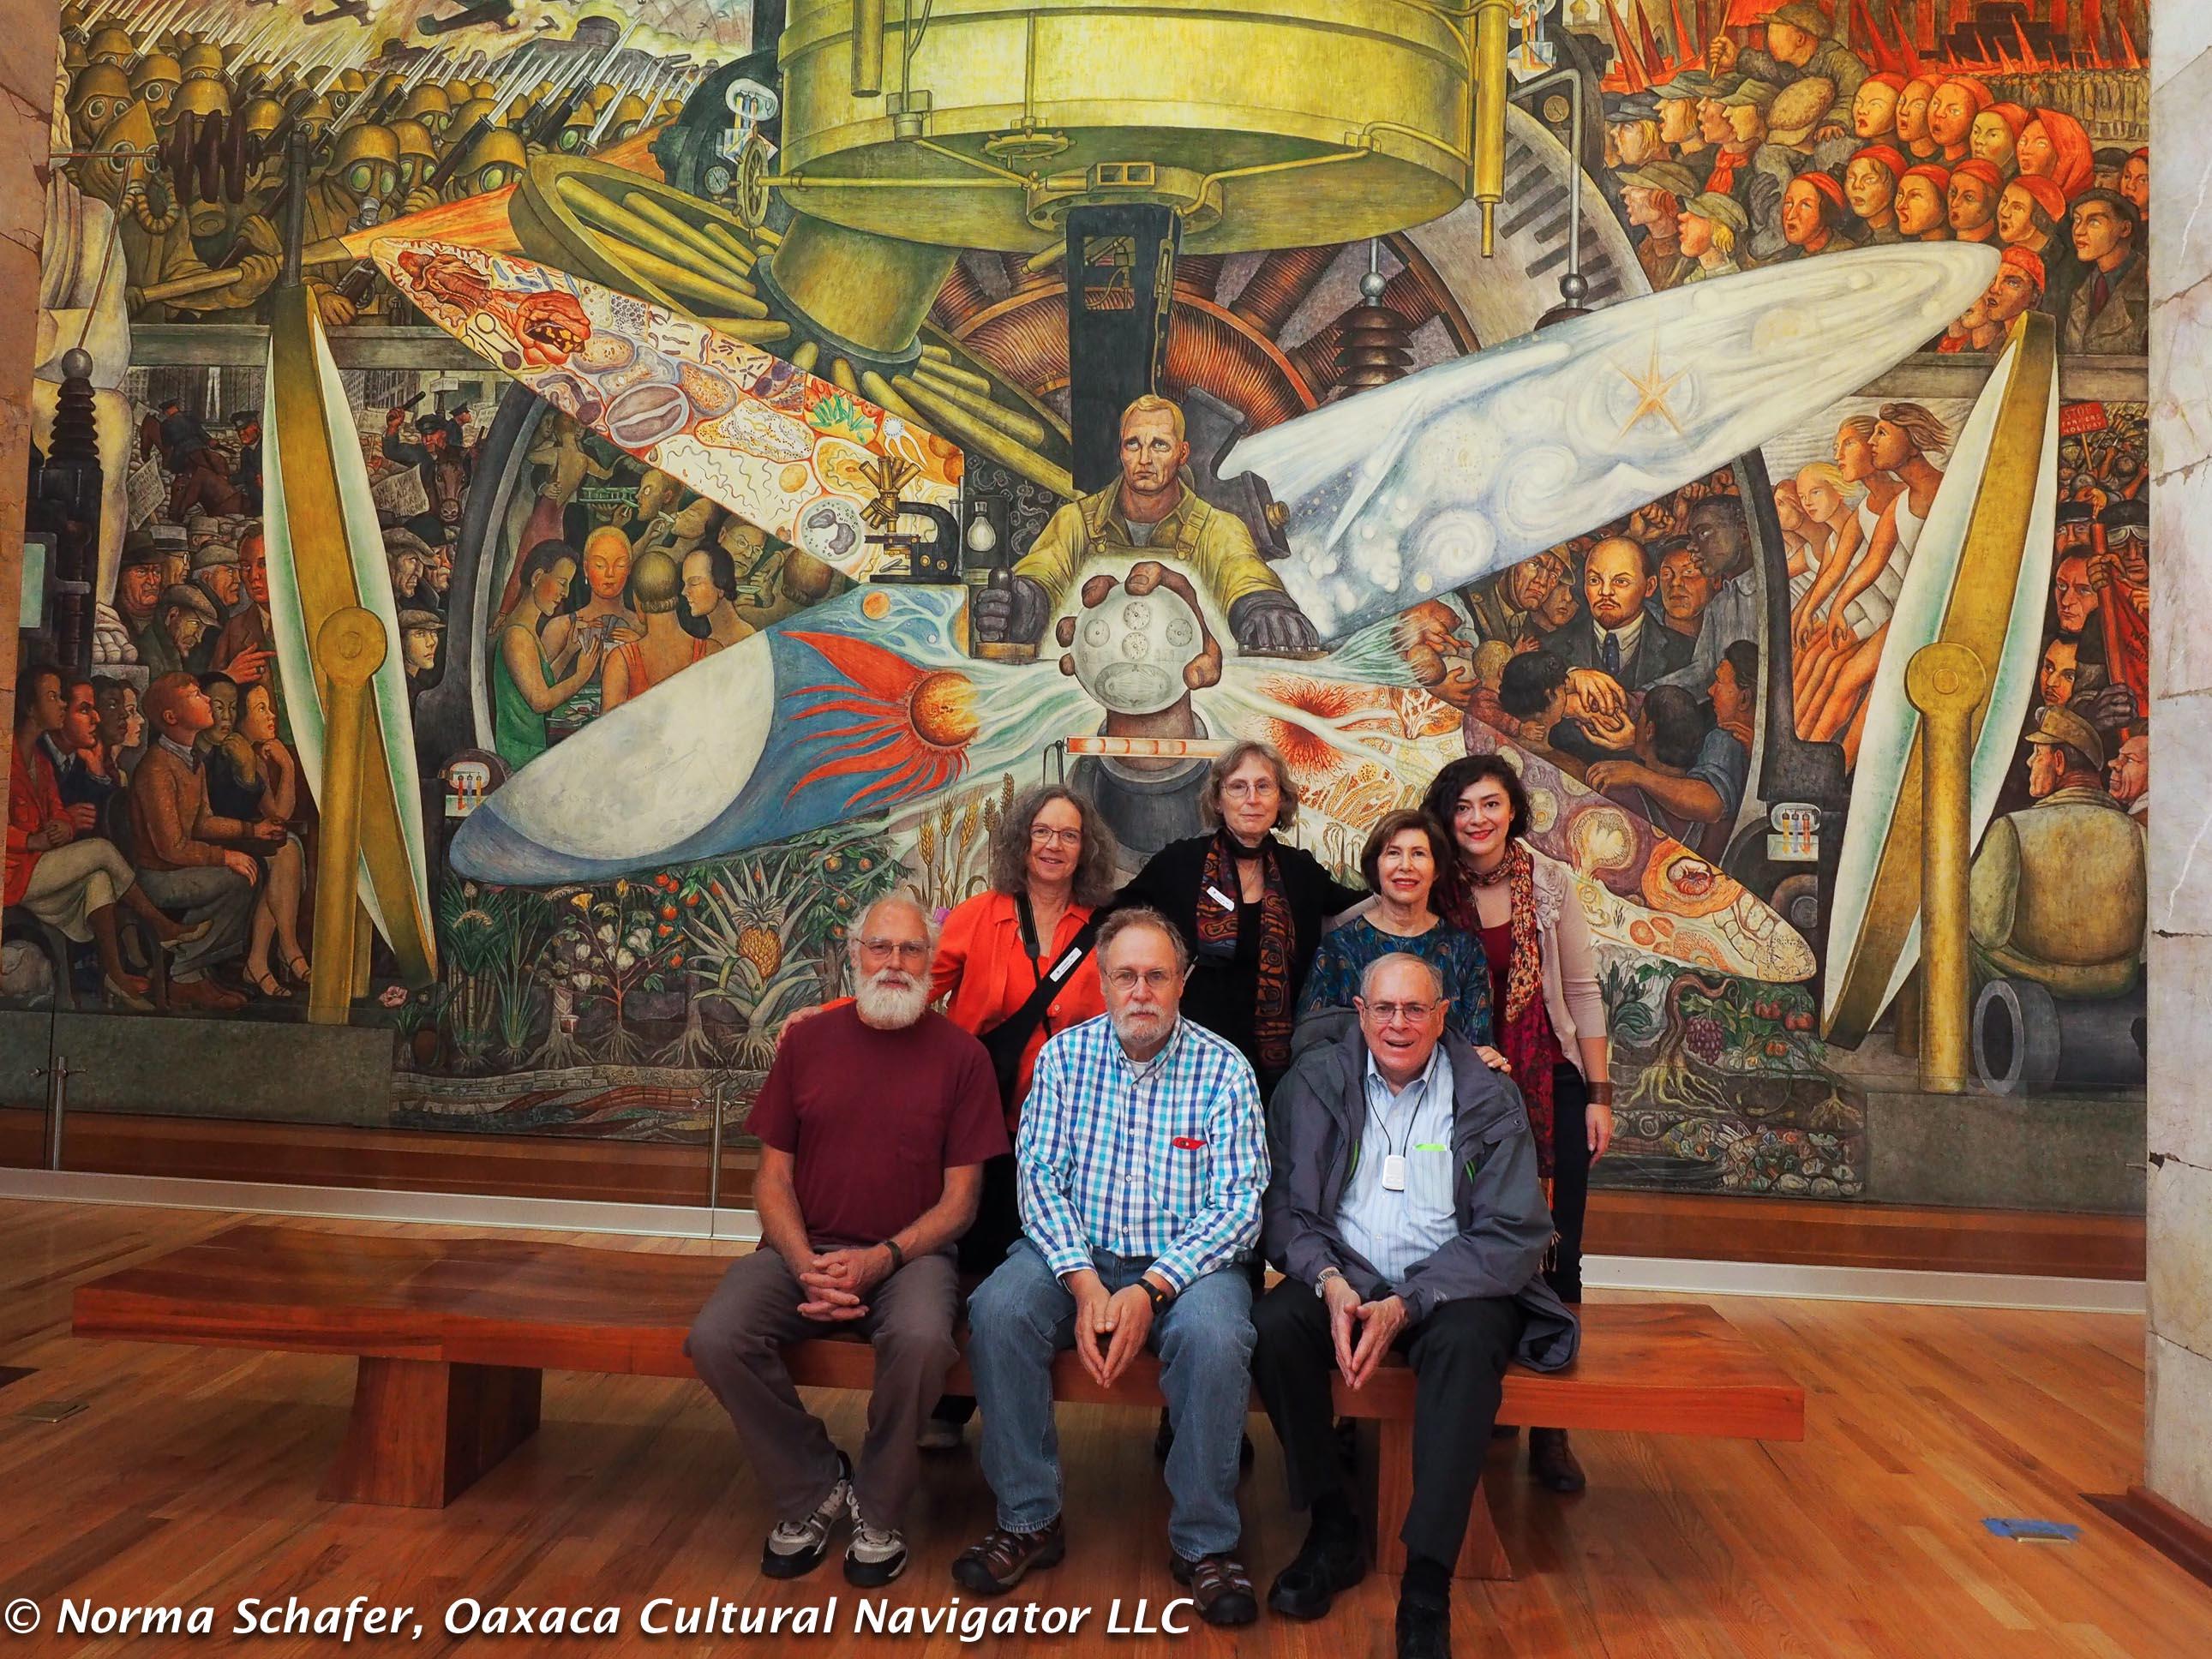 Murals oaxaca cultural navigator norma schafer for Diego rivera rockefeller mural